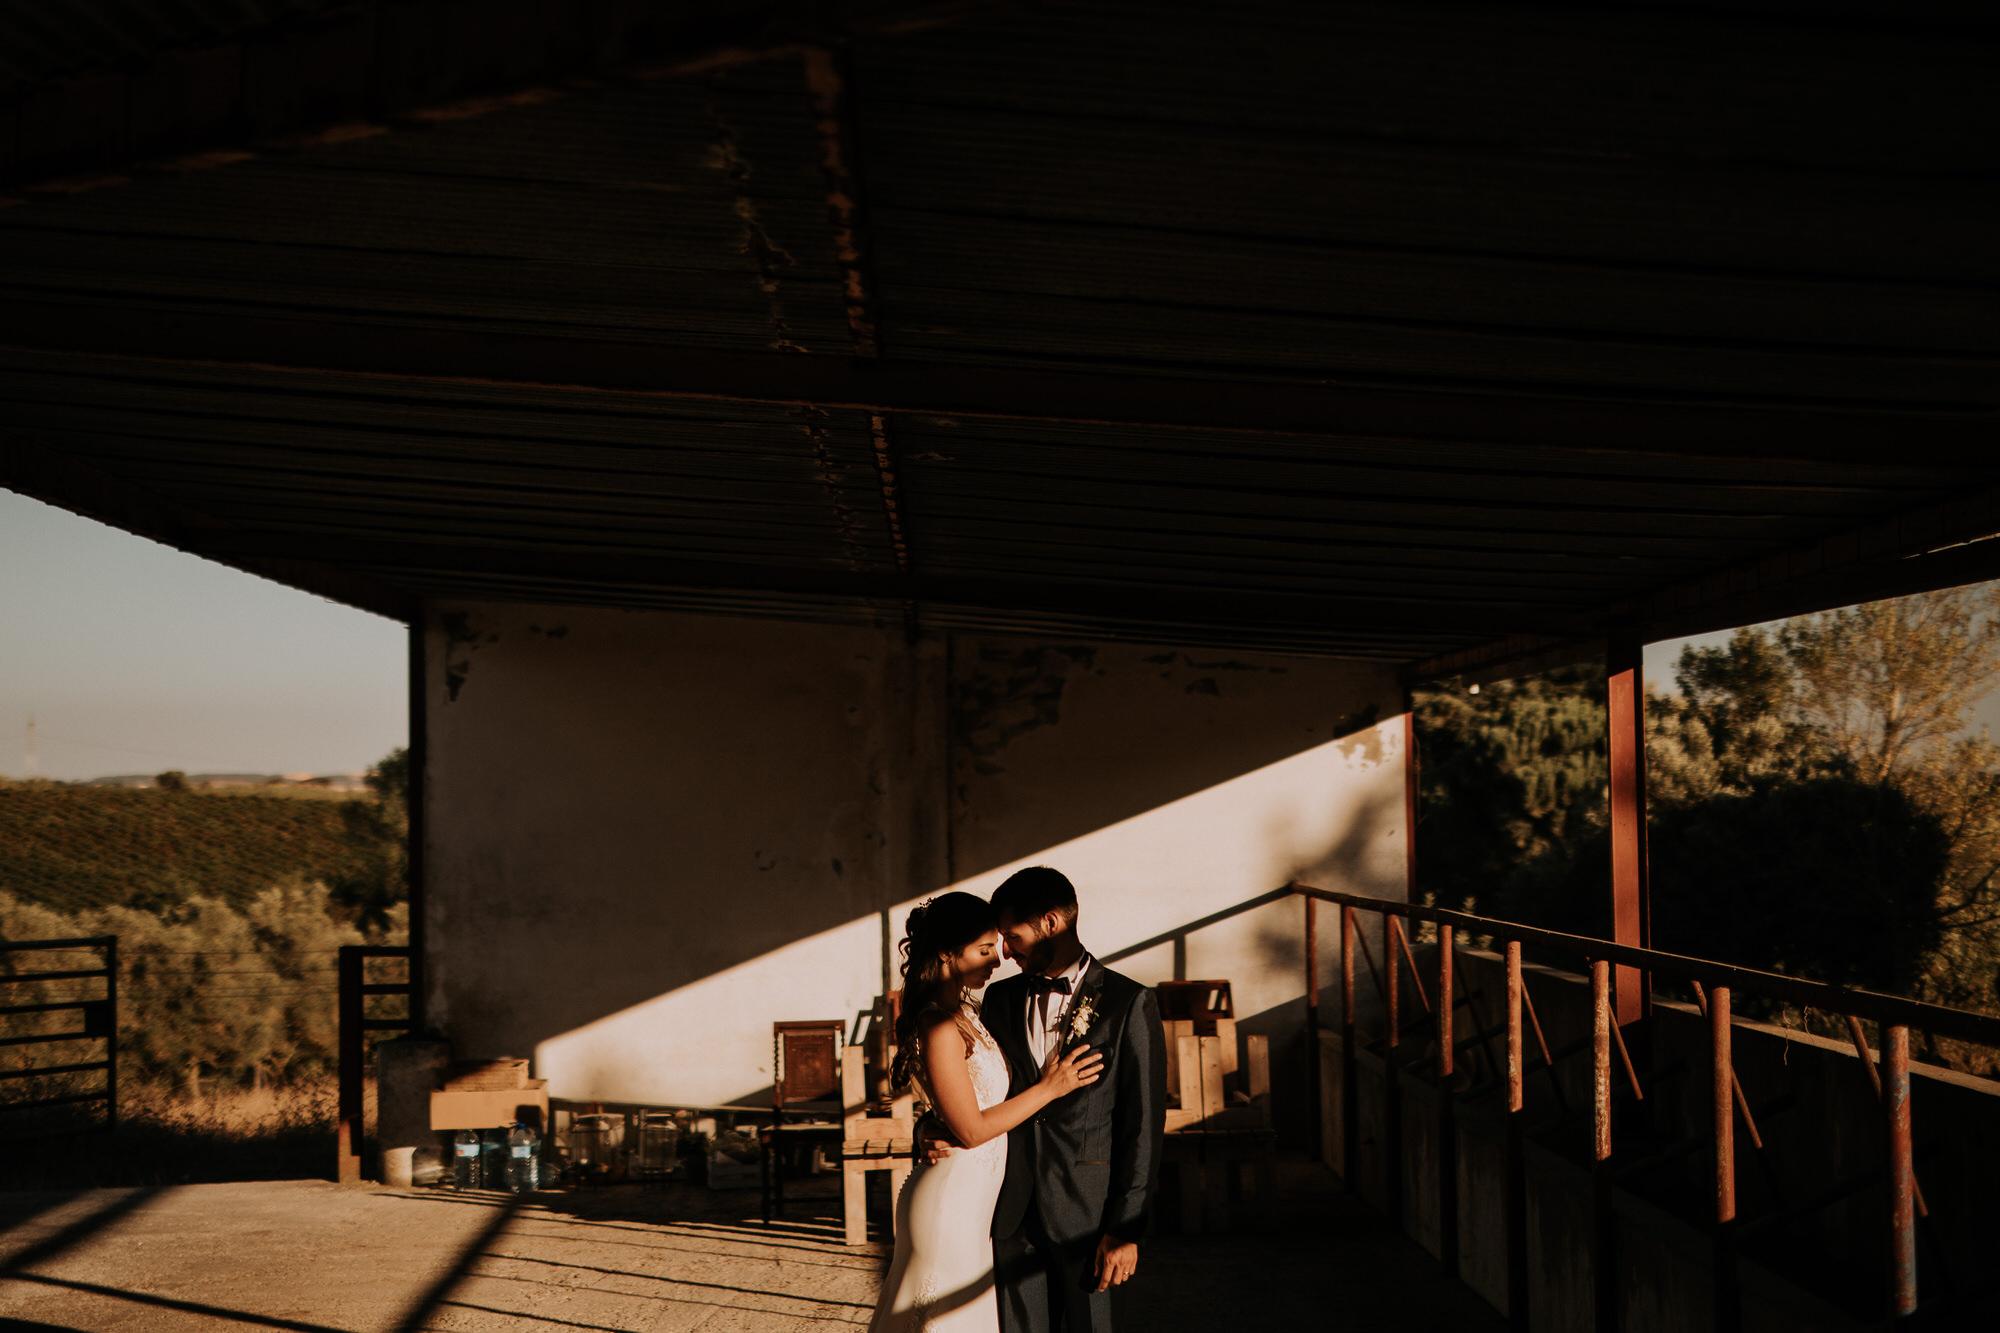 57 filipe_santiago_fotografia_casamento_decoracao_rustico_alenquer_inspiracao_quinta-da-bichinha_sao_goncalo_melhores_quintas_lisboa_distrito_fotografos_fotografia_natural_tendencias_flores_sombras_criativas_